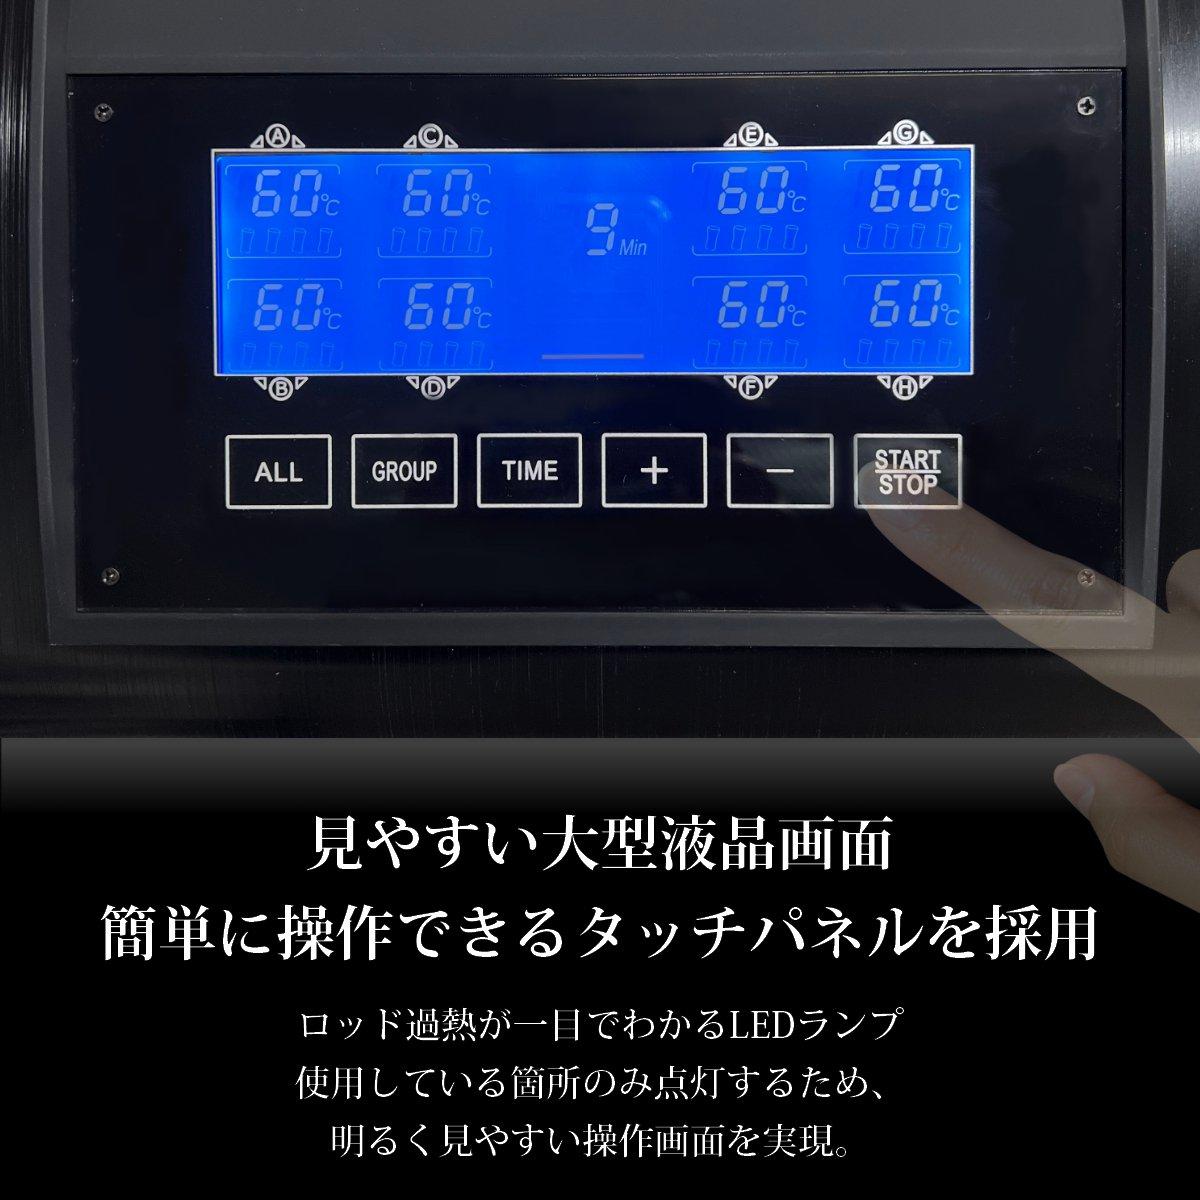 <img class='new_mark_img1' src='https://img.shop-pro.jp/img/new/icons29.gif' style='border:none;display:inline;margin:0px;padding:0px;width:auto;' />【新品/送料無料】美容室の即戦力!『簡単なのに機能十分!新型デジタルパーマ機 NJ-R』 ★ロッド32本+断熱シートサービス中!